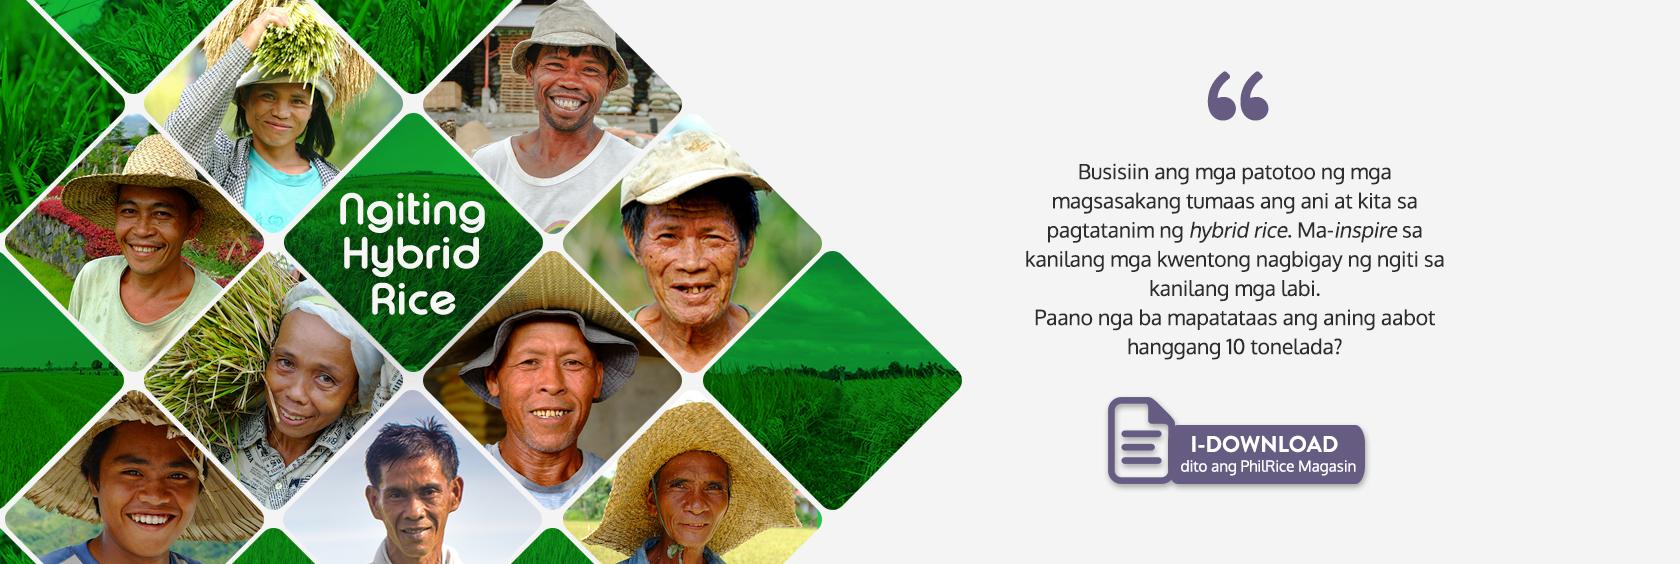 3Q Tagalog Magasin 2017 slider